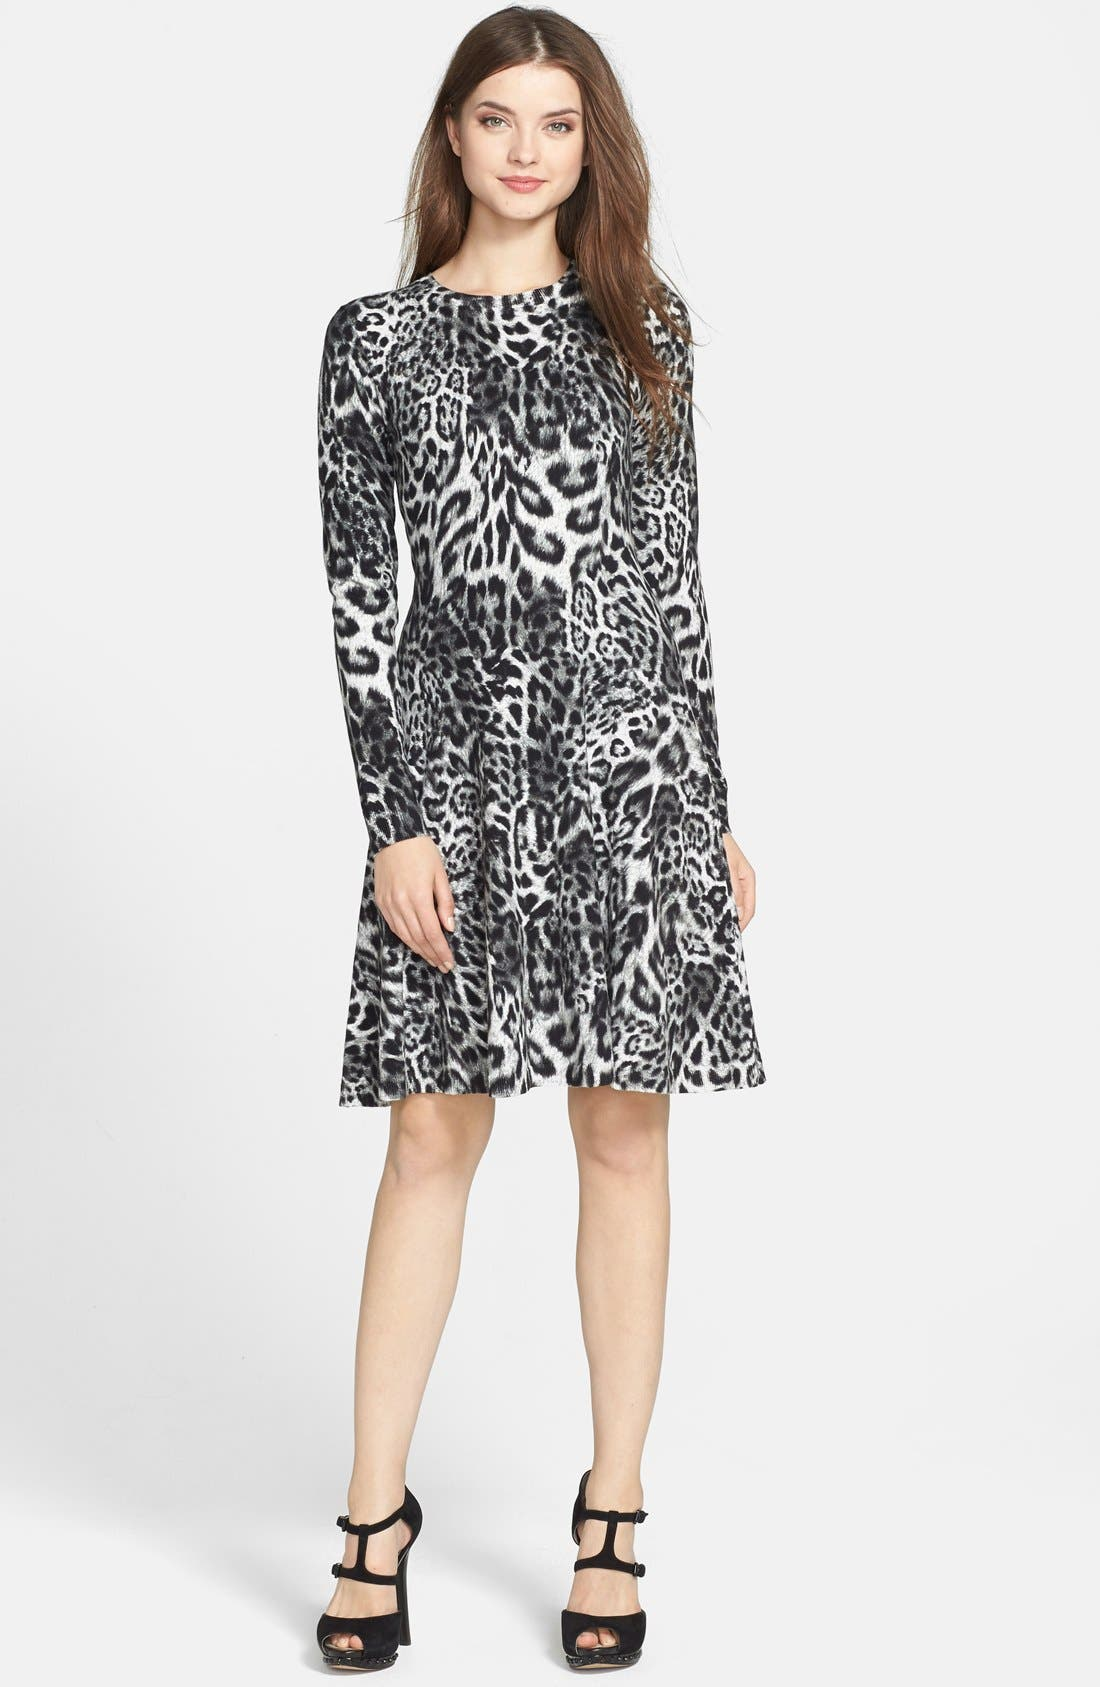 Alternate Image 1 Selected - MICHAEL Michael Kors 'Fremont' Leopard Print Fit & Flare Dress (Regular & Petite)